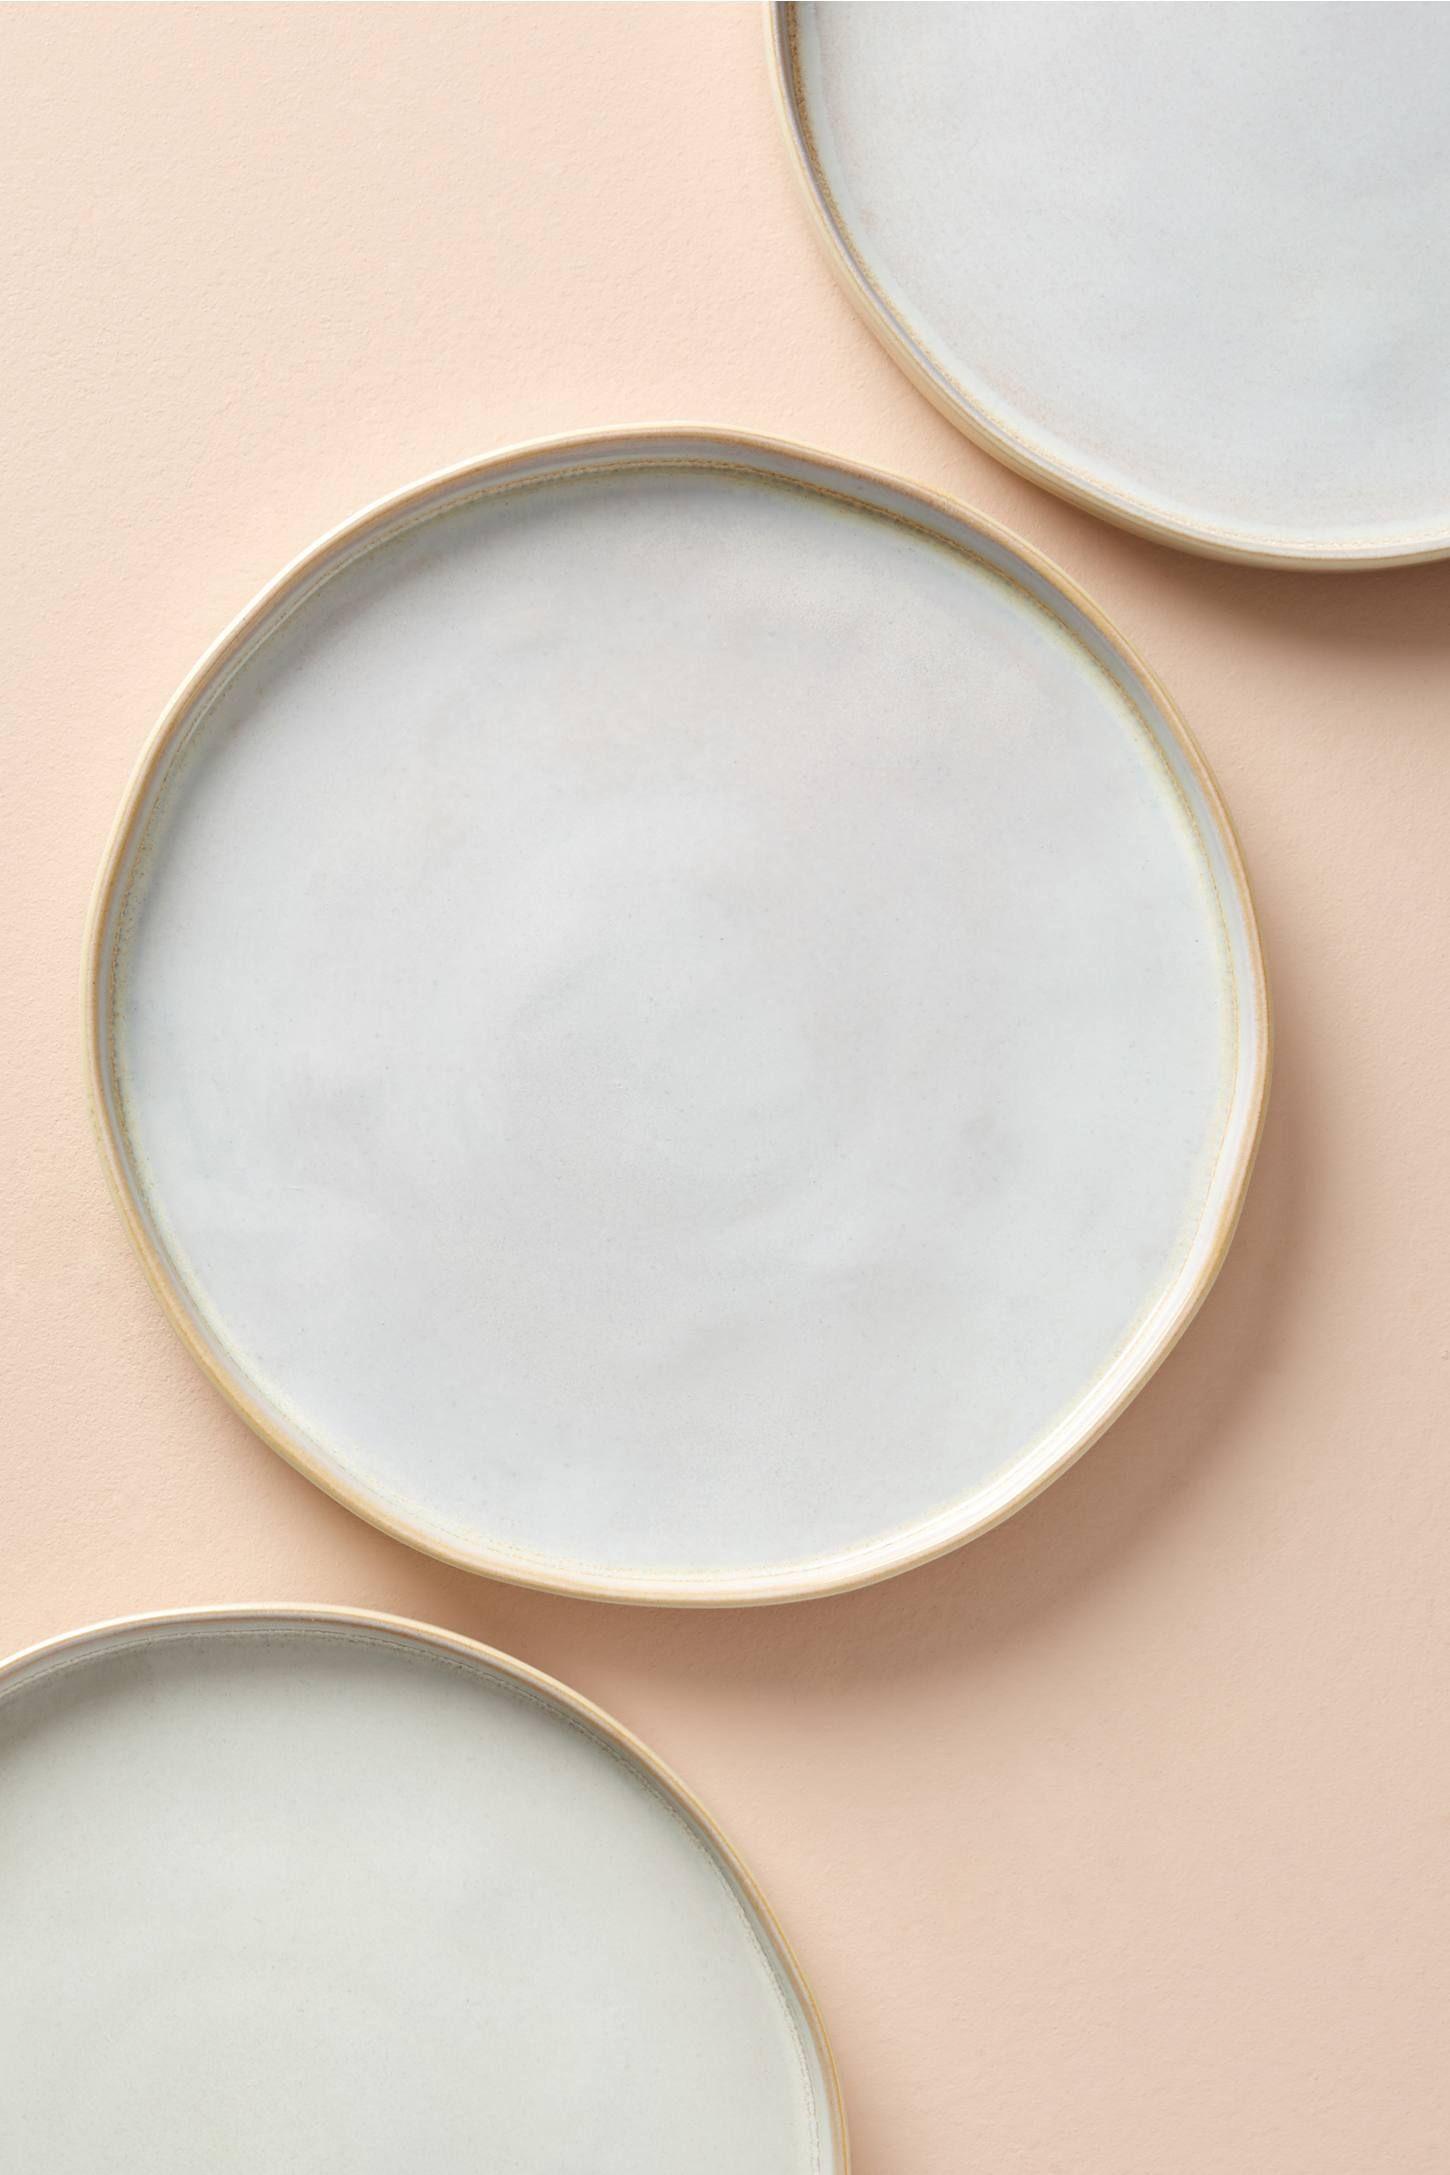 Ngai Japanese Style Striped Design Ceramic Bowl Plate Dinnerware Set Soup Bowls Ceramic Dinnerware Ceramic Dinnerware